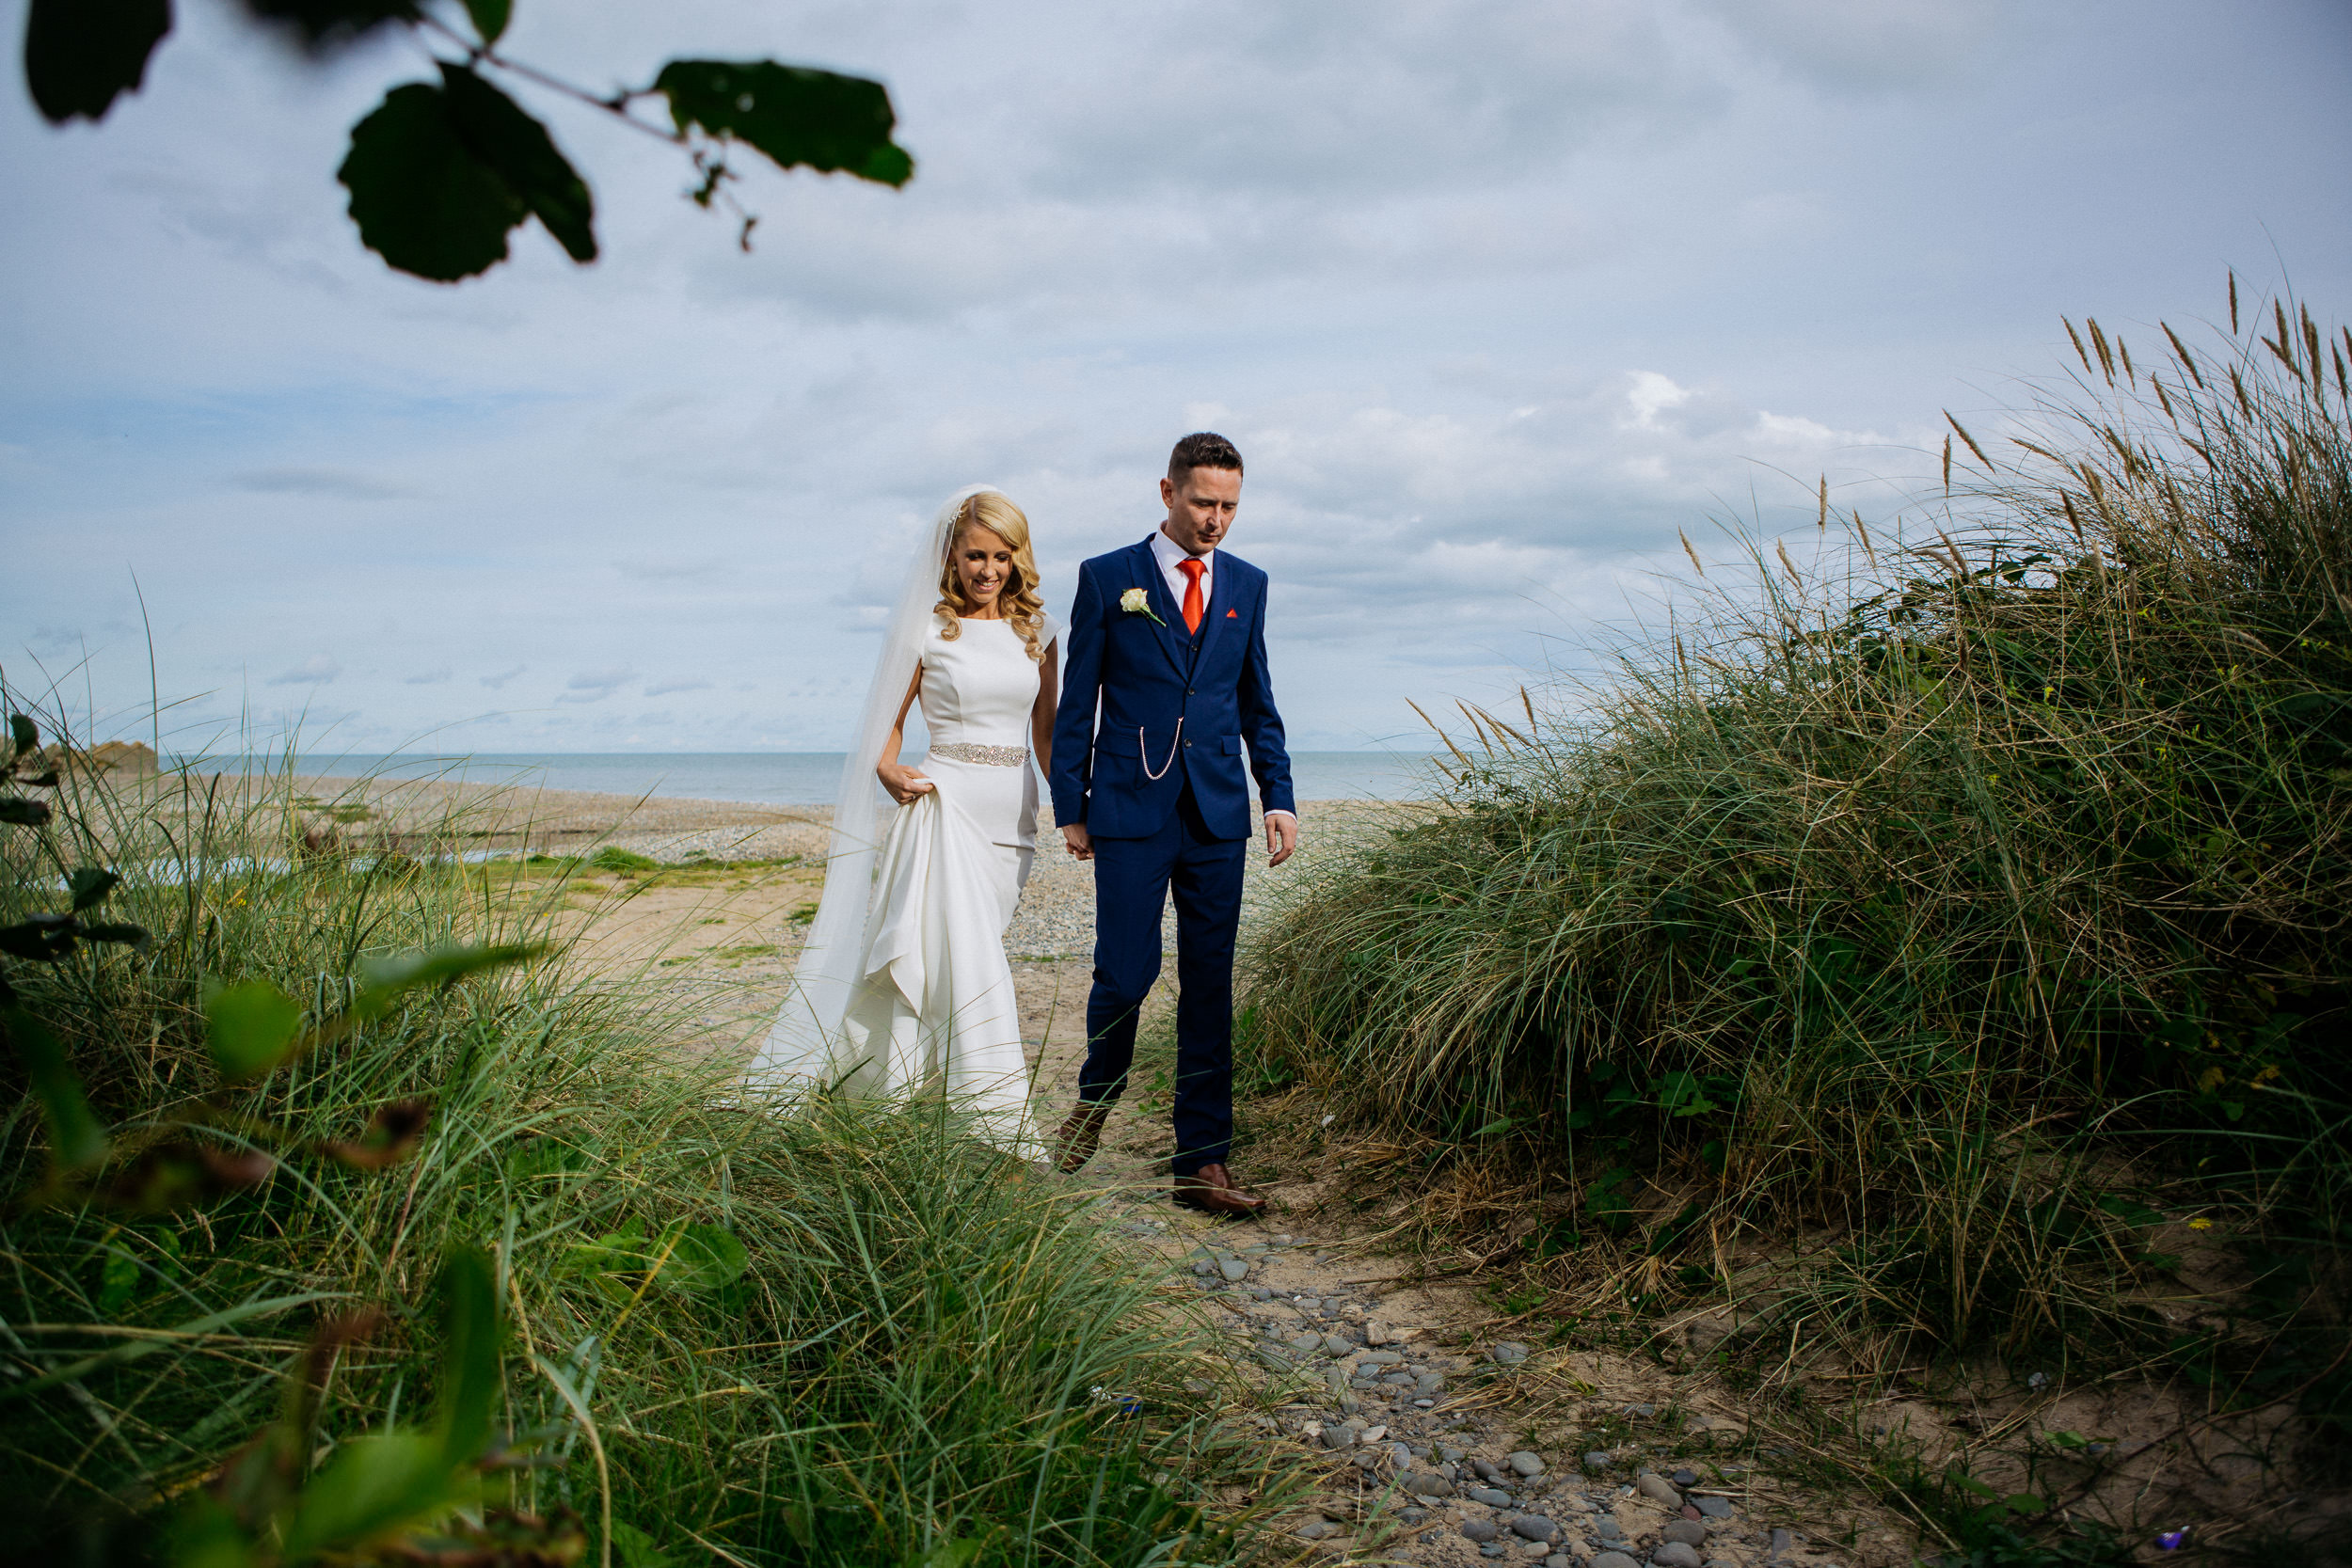 Aoife & Barry // Wedding // Seafield